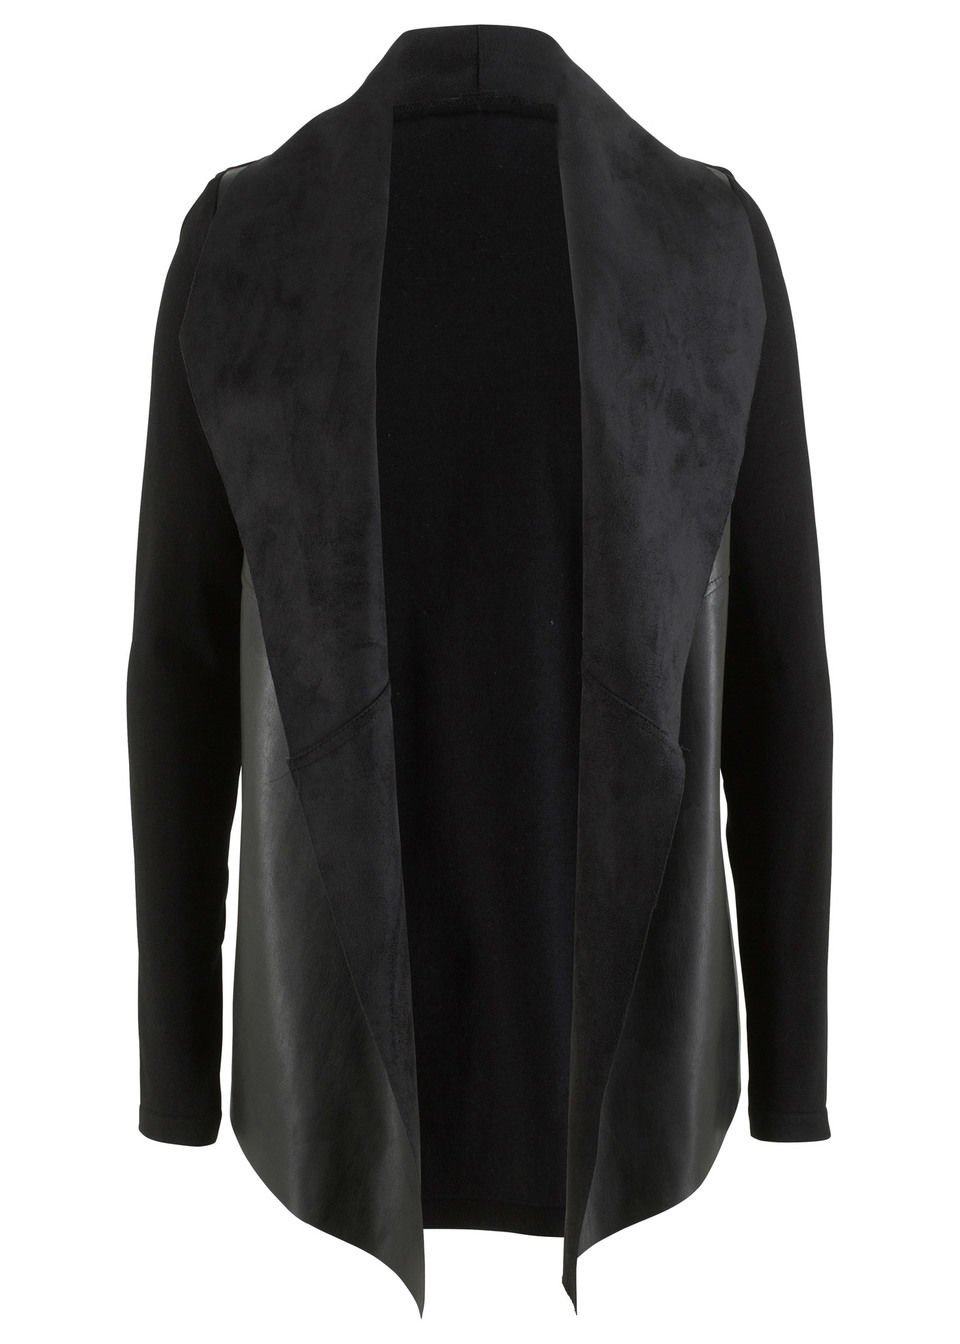 Jachetă, design Maite Kelly bonprix